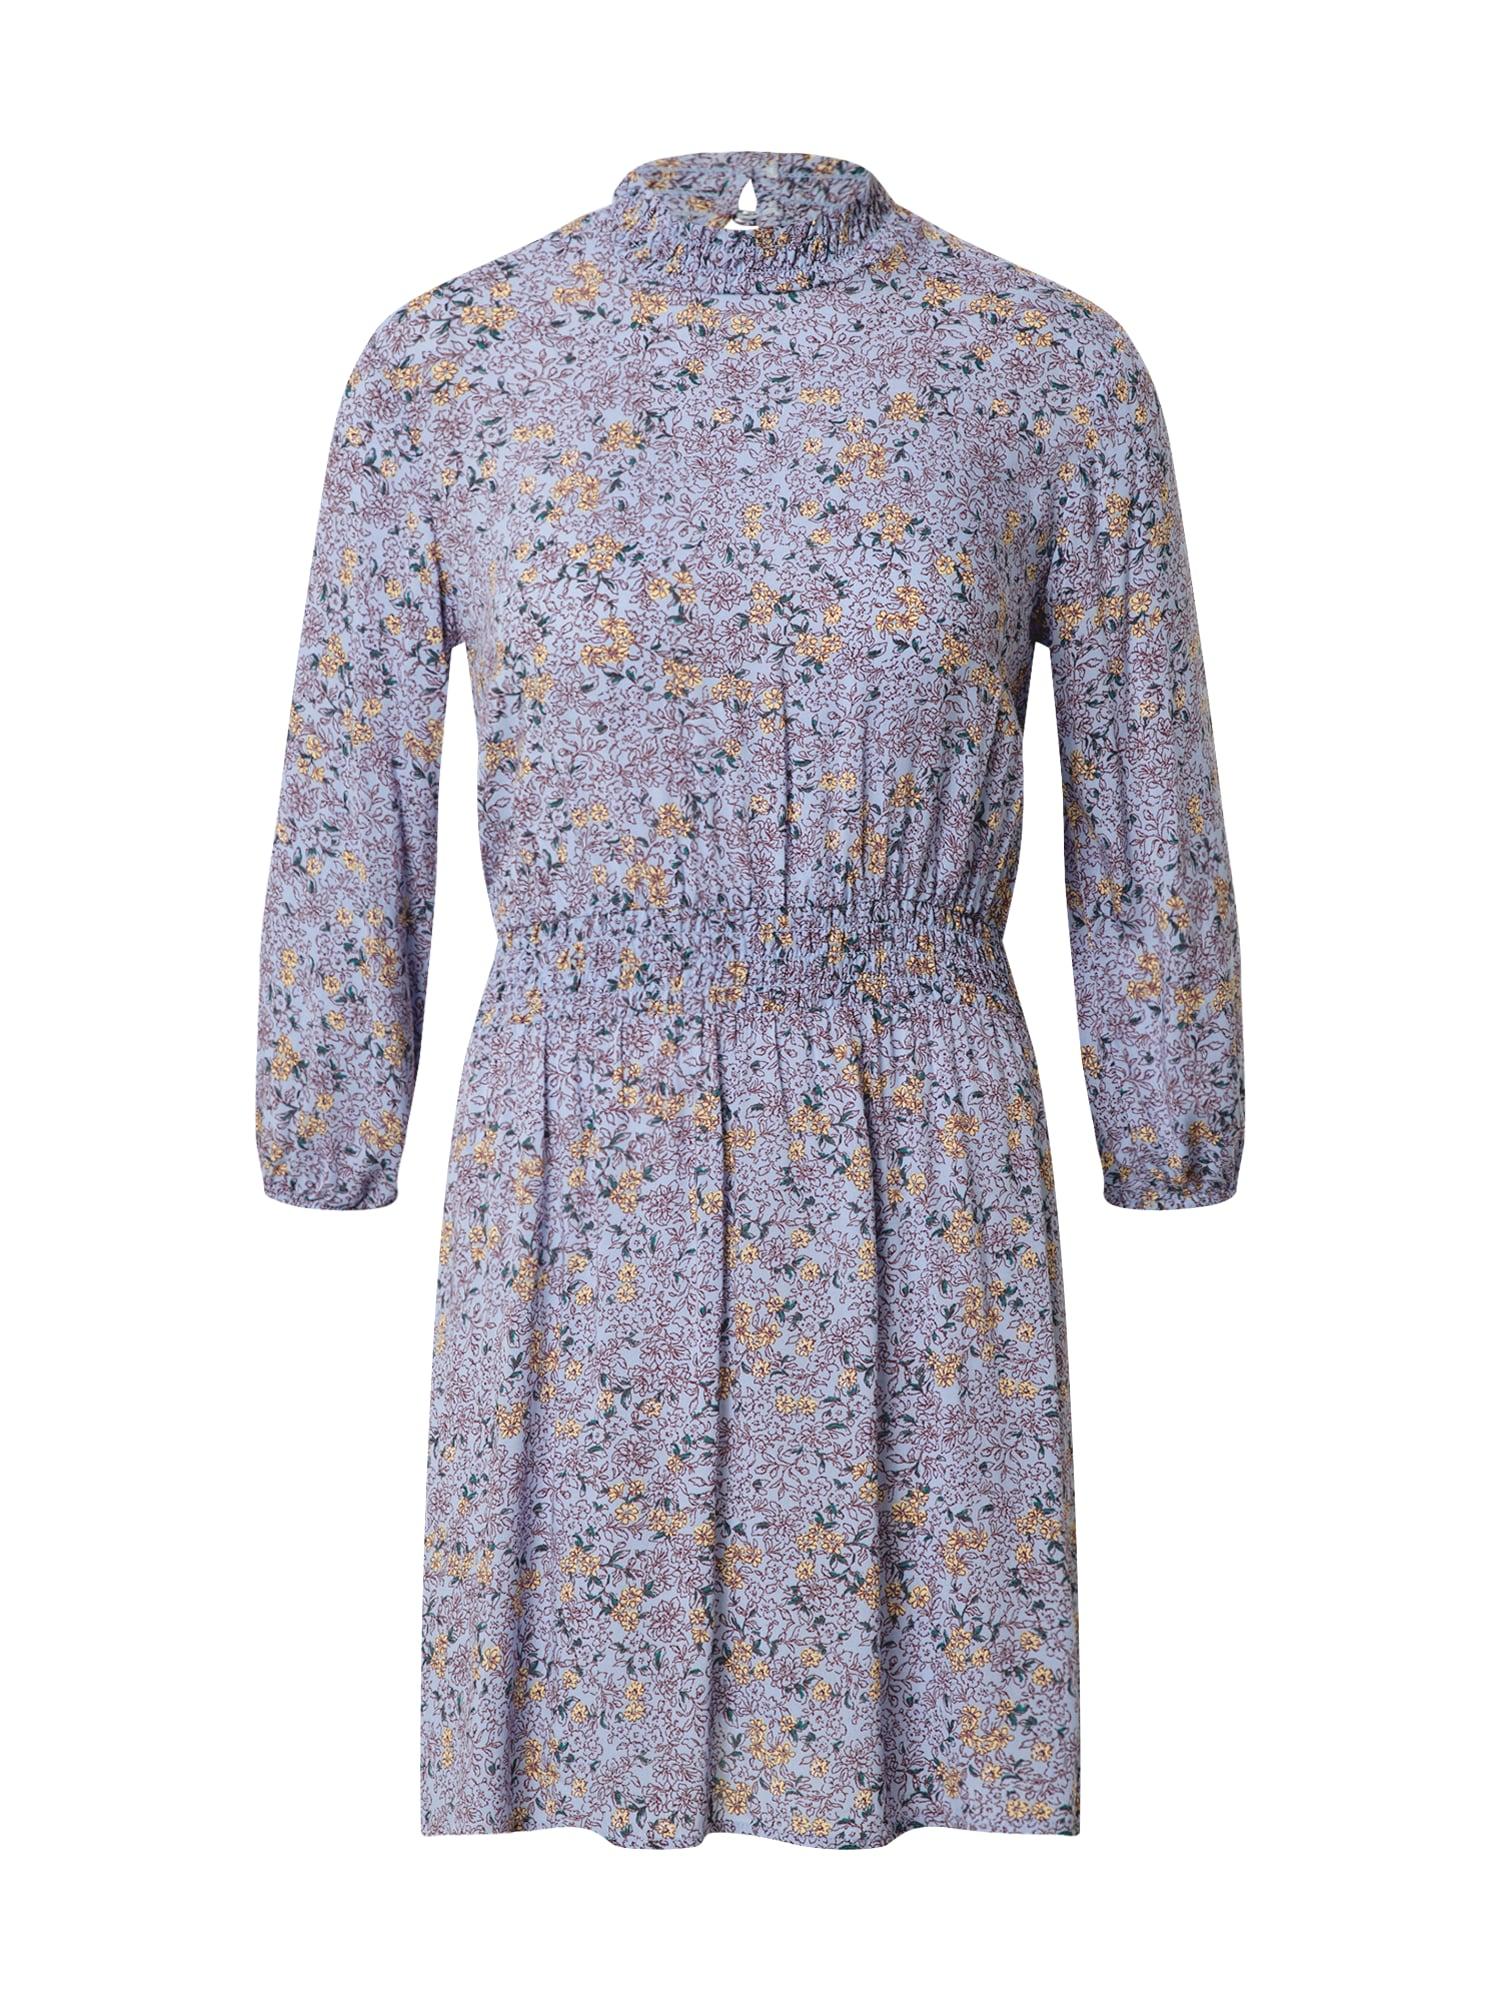 Pimkie Šaty 'D-Onana'  modrá / mix barev